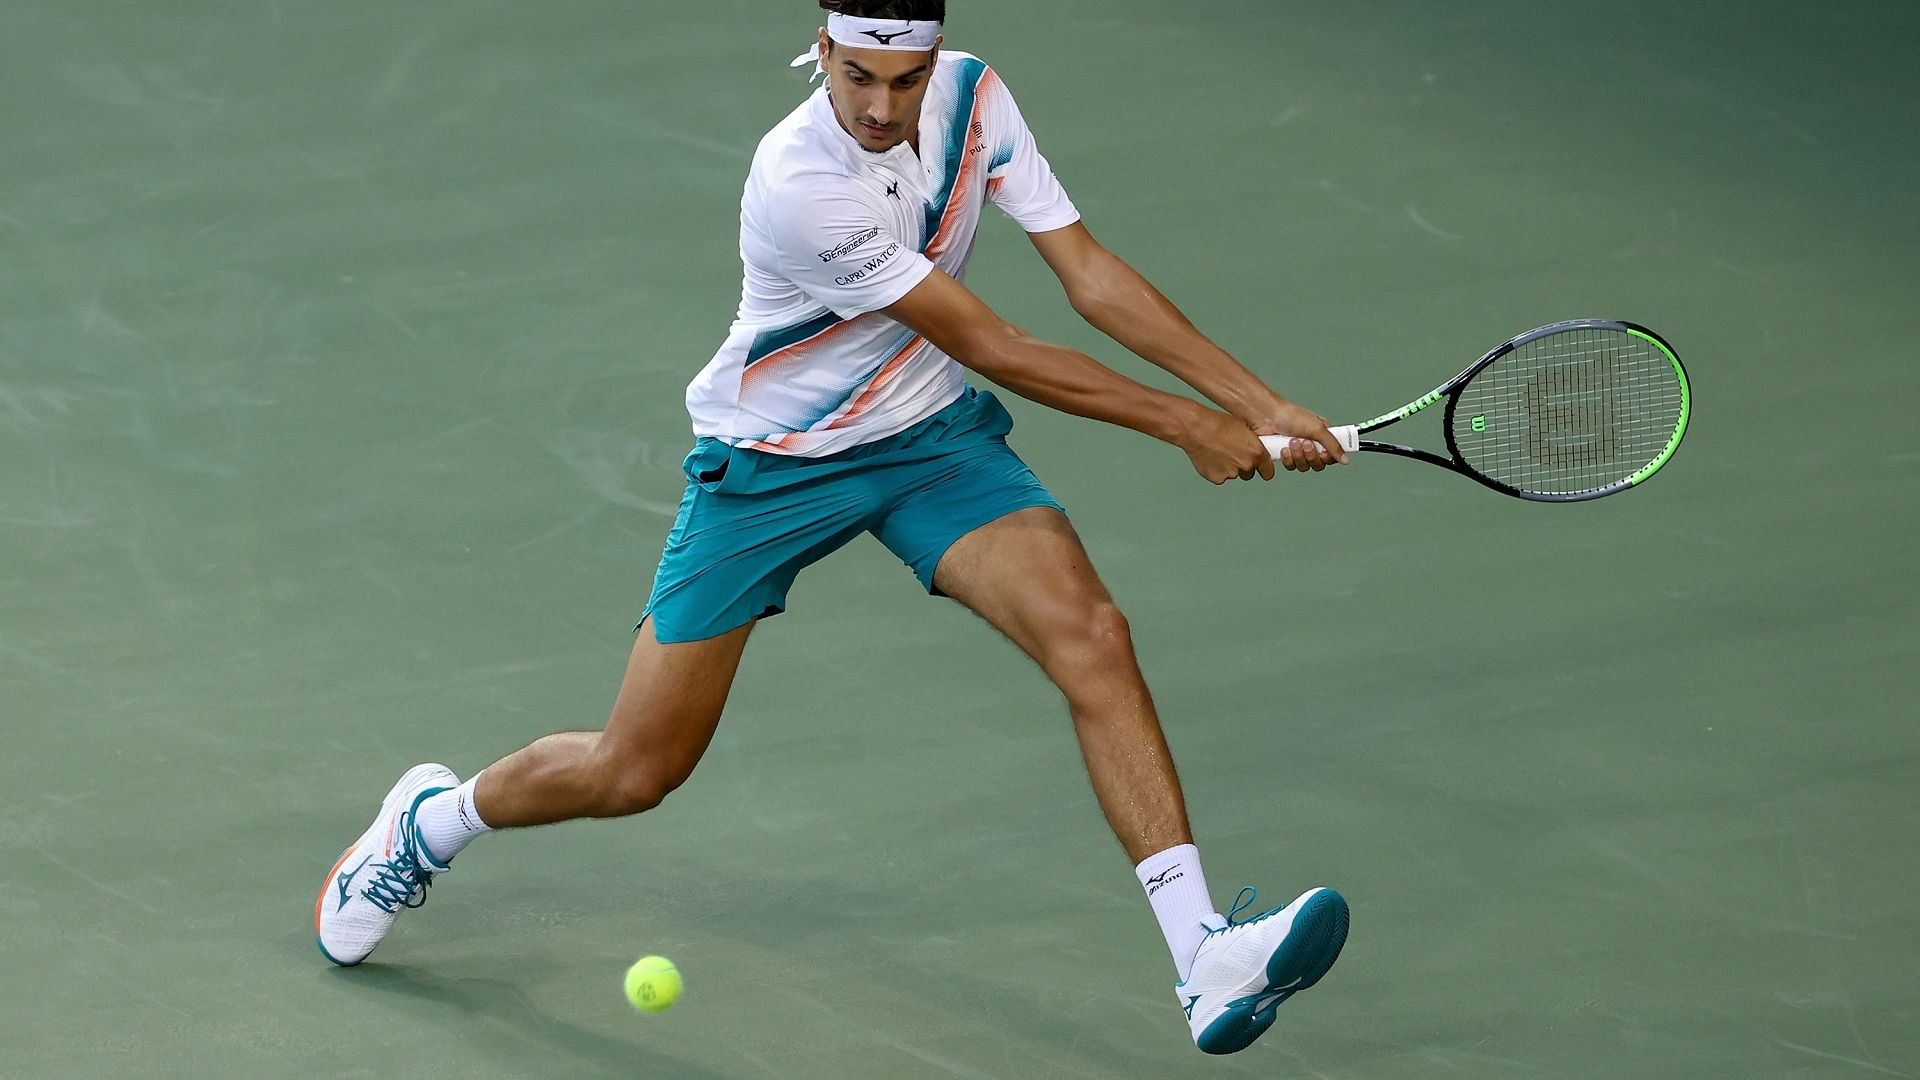 Лоренцо Сонего откри с победа тенис турнира в Мец